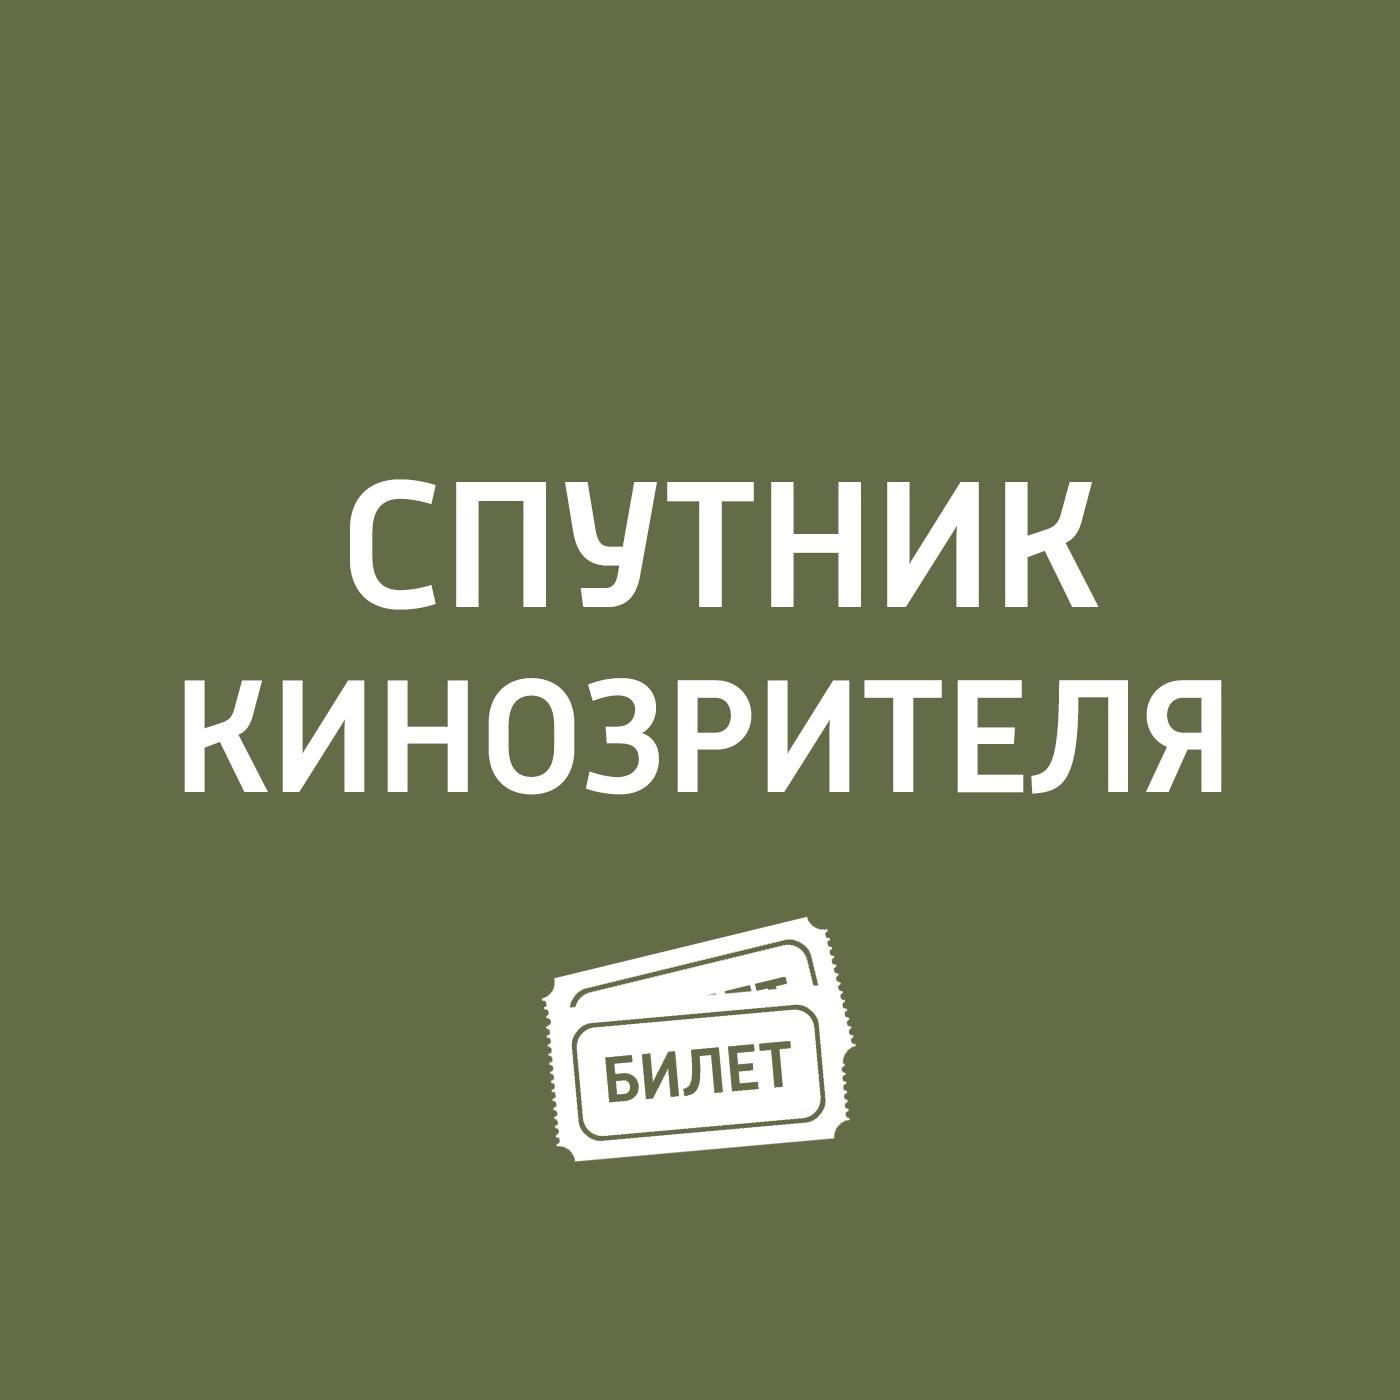 Антон Долин Антон Долин о «Большом фестивале мультфильмов»